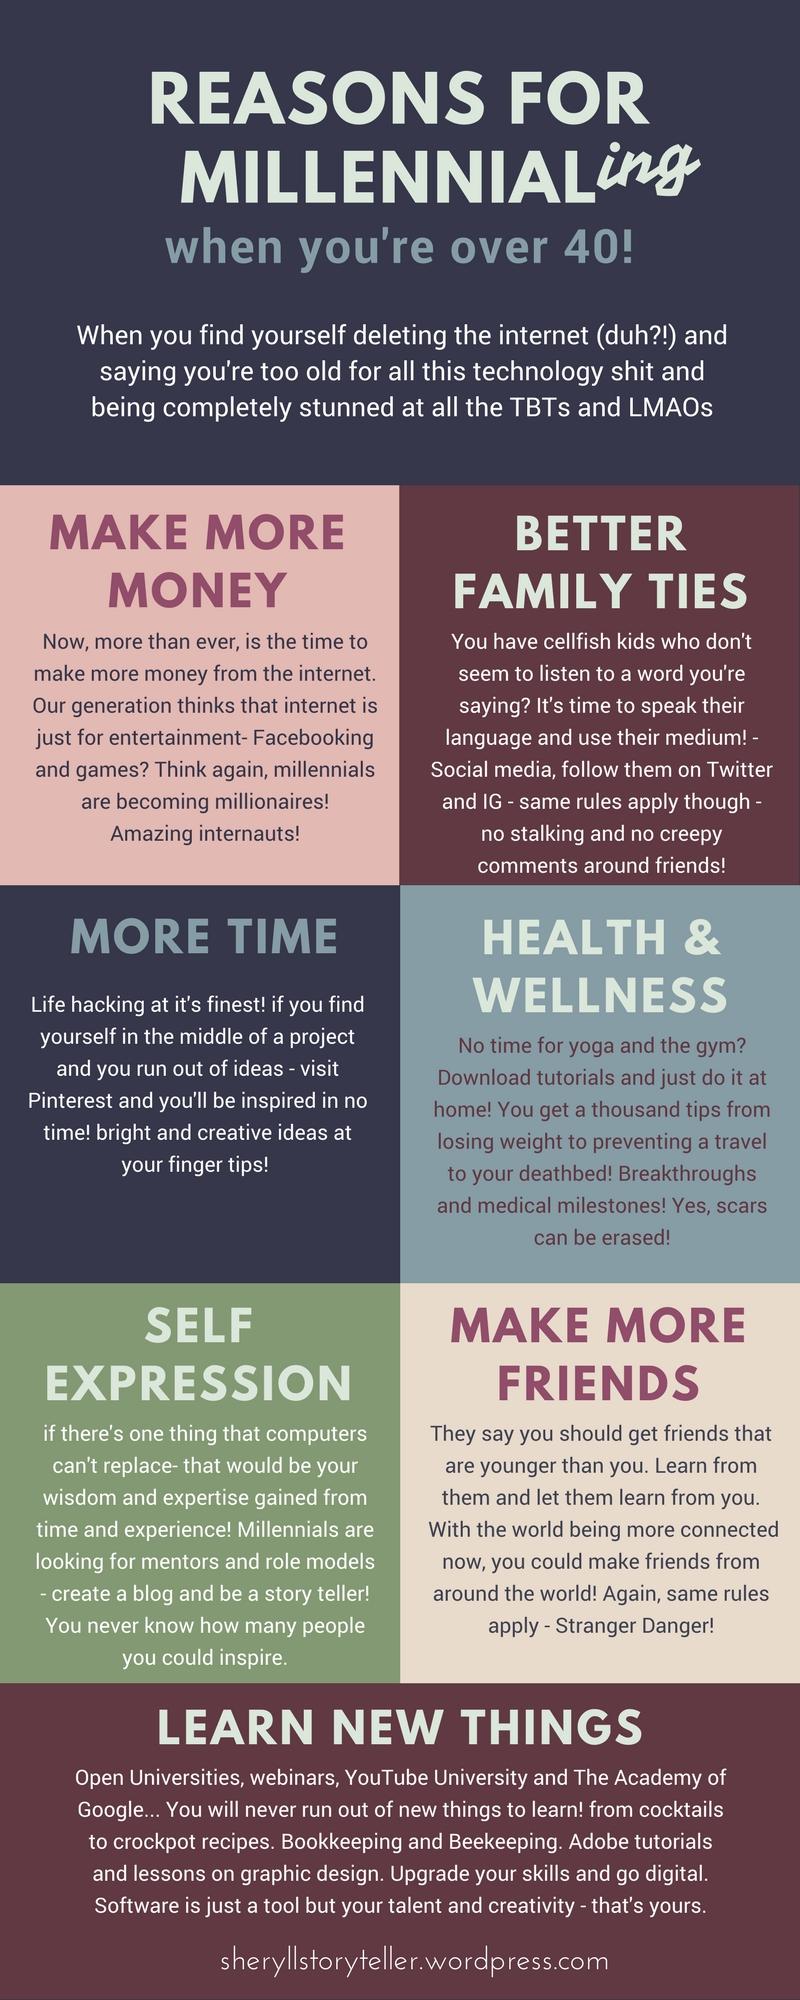 reasons-for-millennial-1